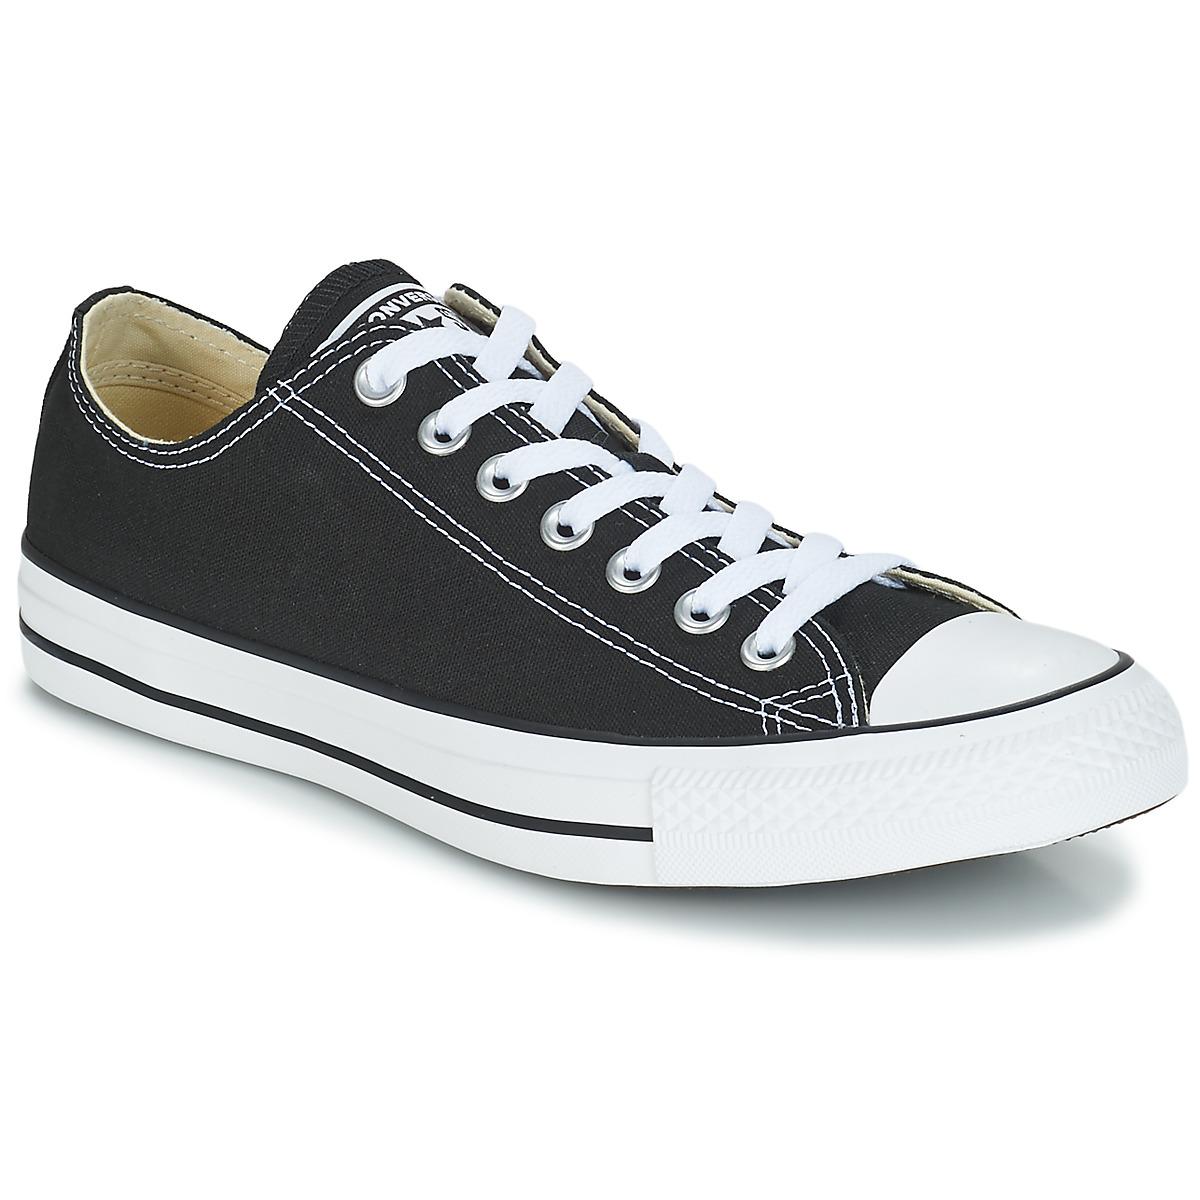 Nizke tenisky Converse CHUCK TAYLOR ALL STAR CORE OX Černá